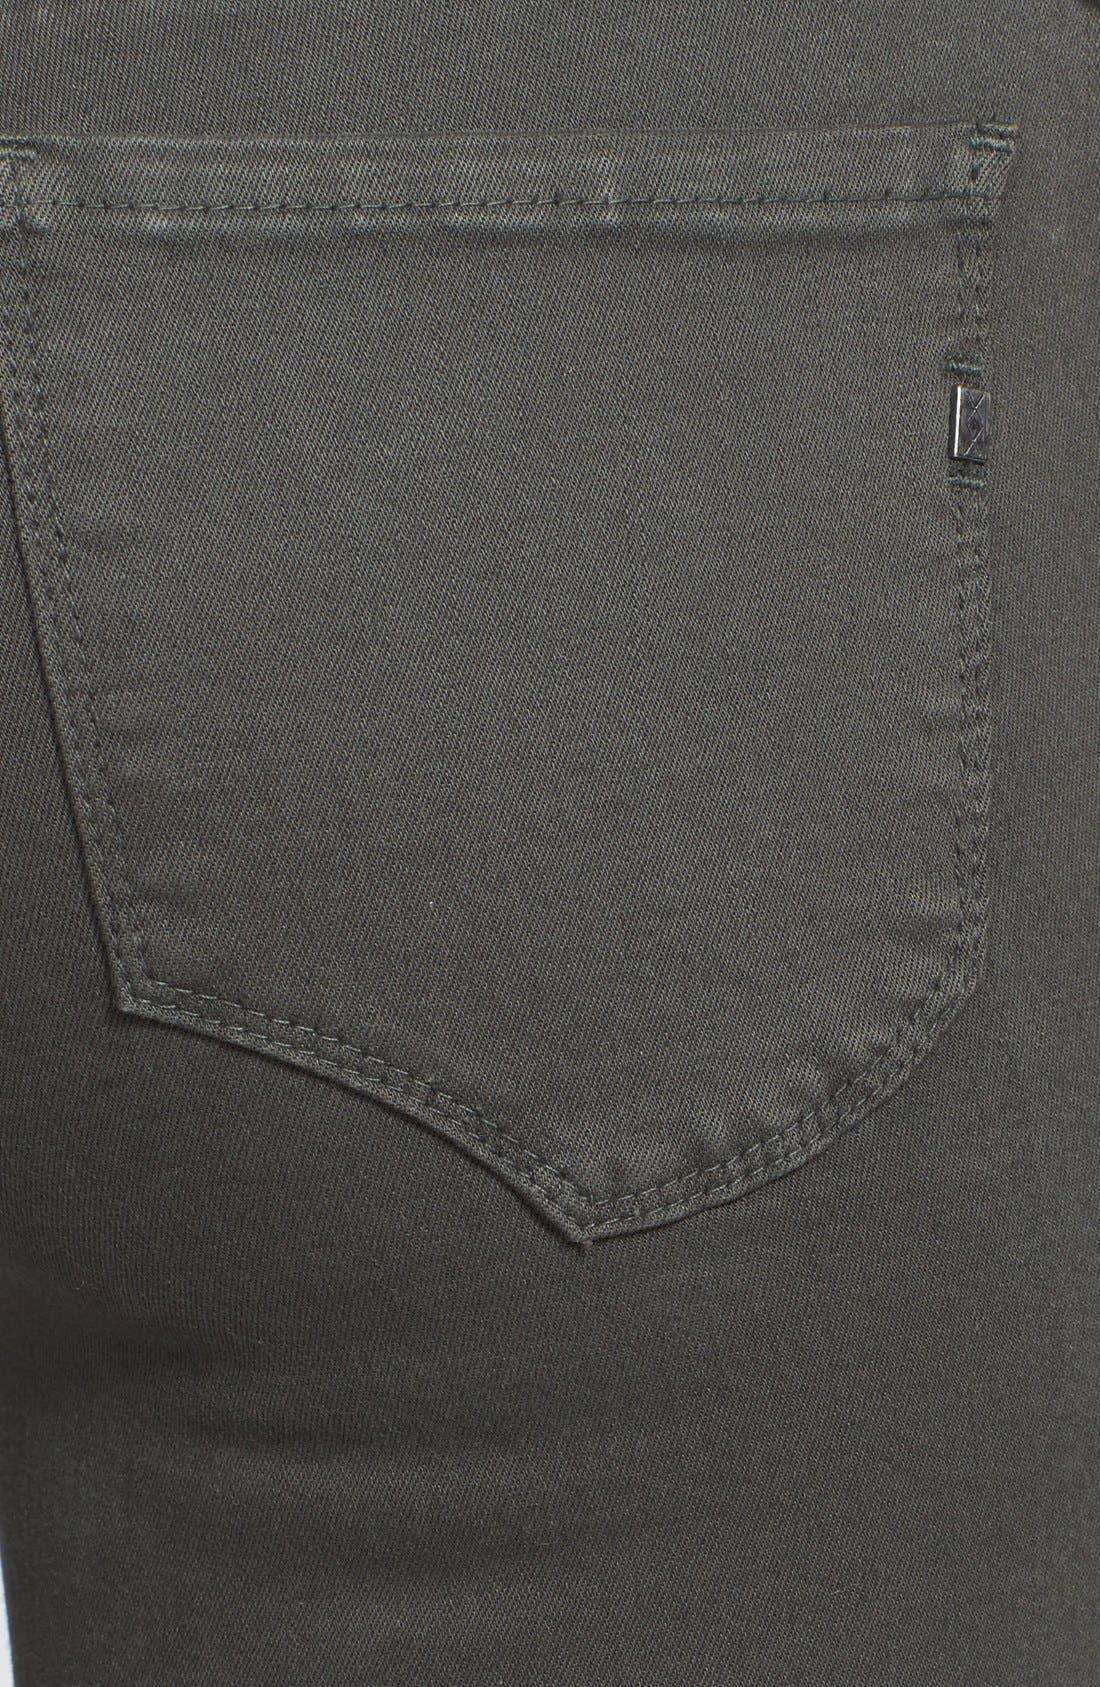 Alternate Image 3  - Genetic 'Sadie' Two-Tone Moto Skinny Jeans (Chrome)